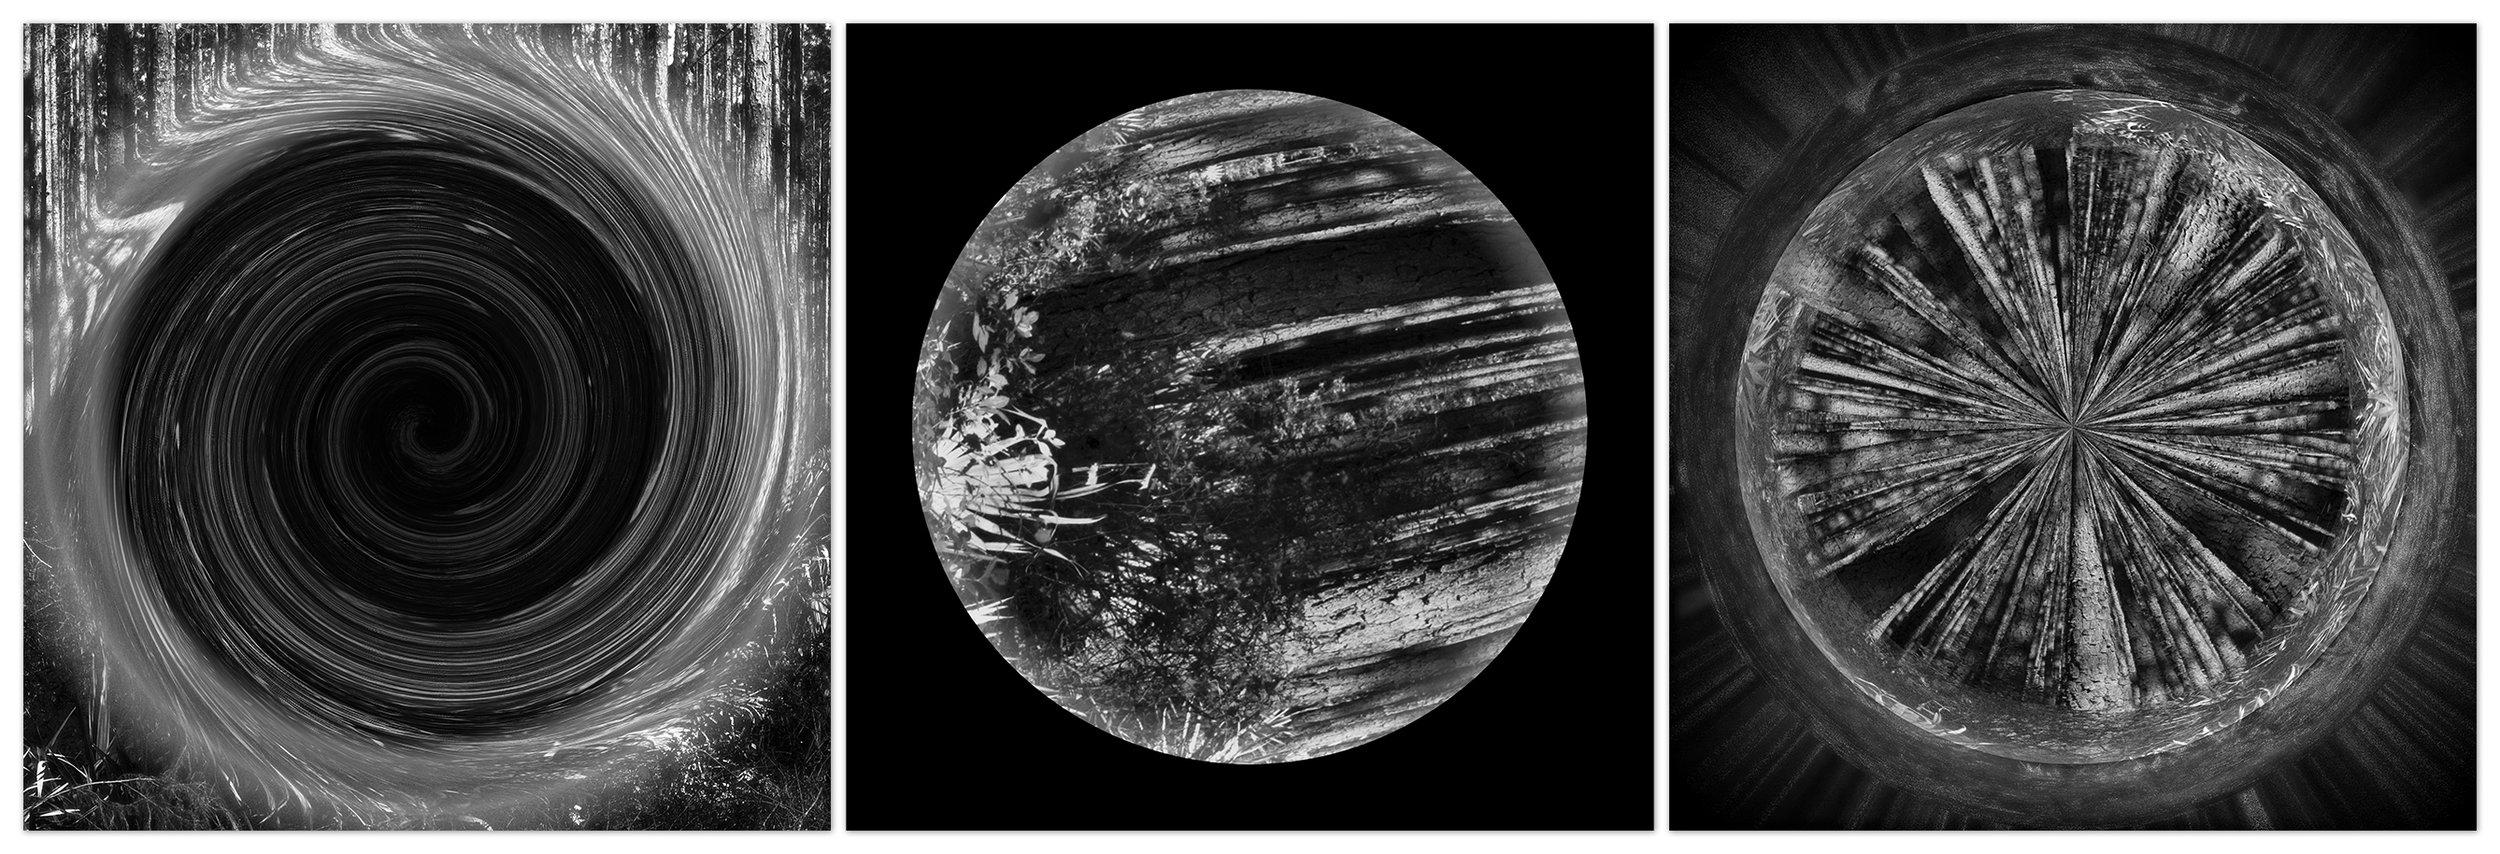 Celestial Bodies of the Osceola Galaxy (Triptych), 2018